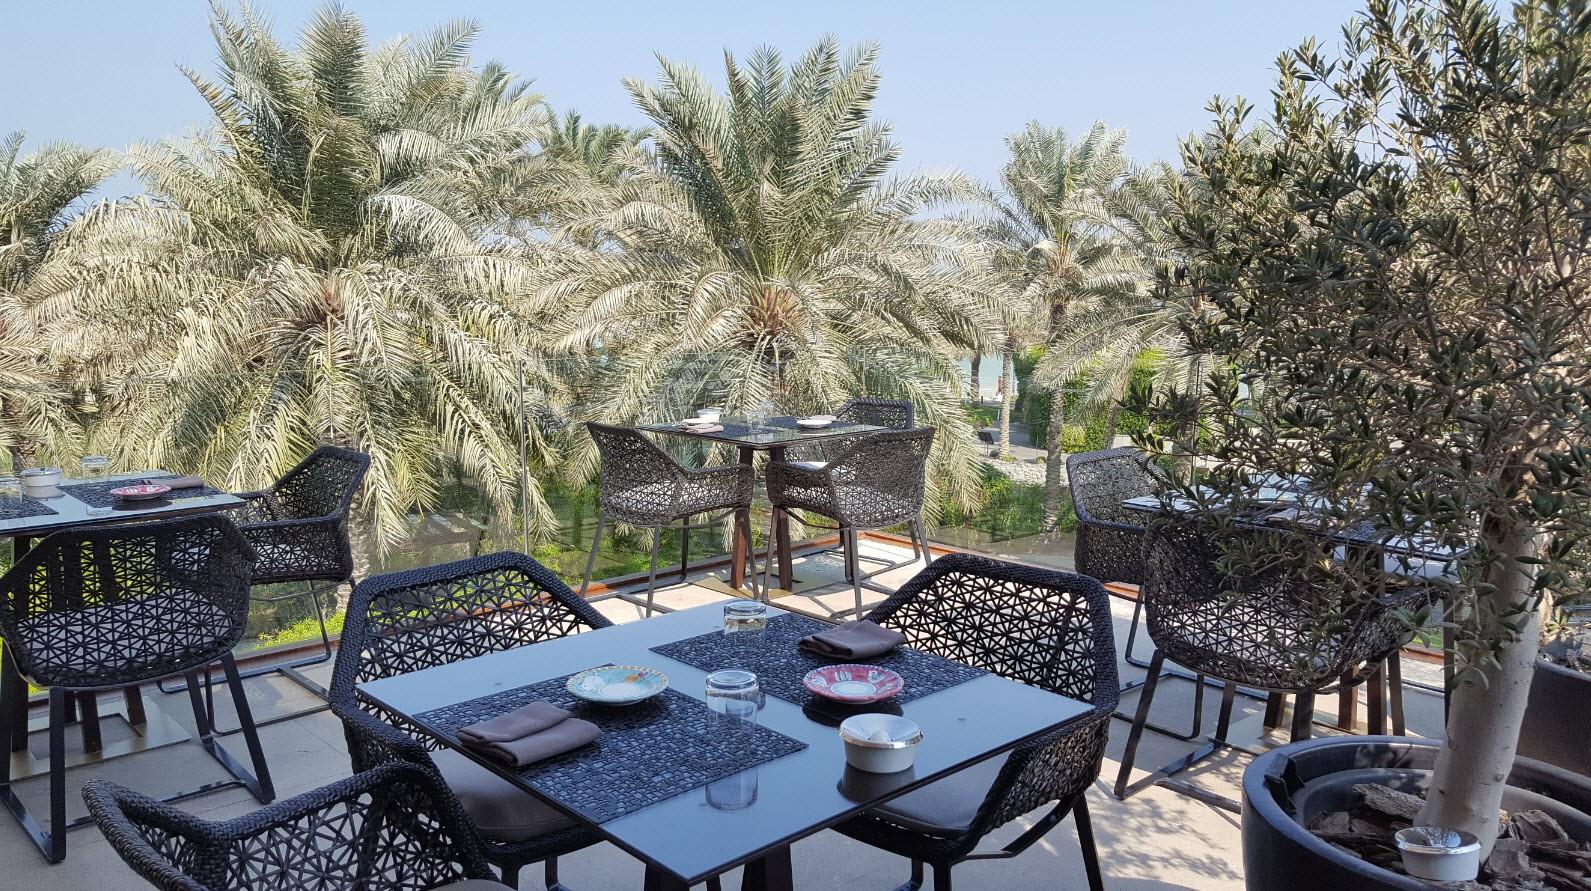 un go t d italie manama primavera au ritz carlton bahrain inspiration for travellers. Black Bedroom Furniture Sets. Home Design Ideas